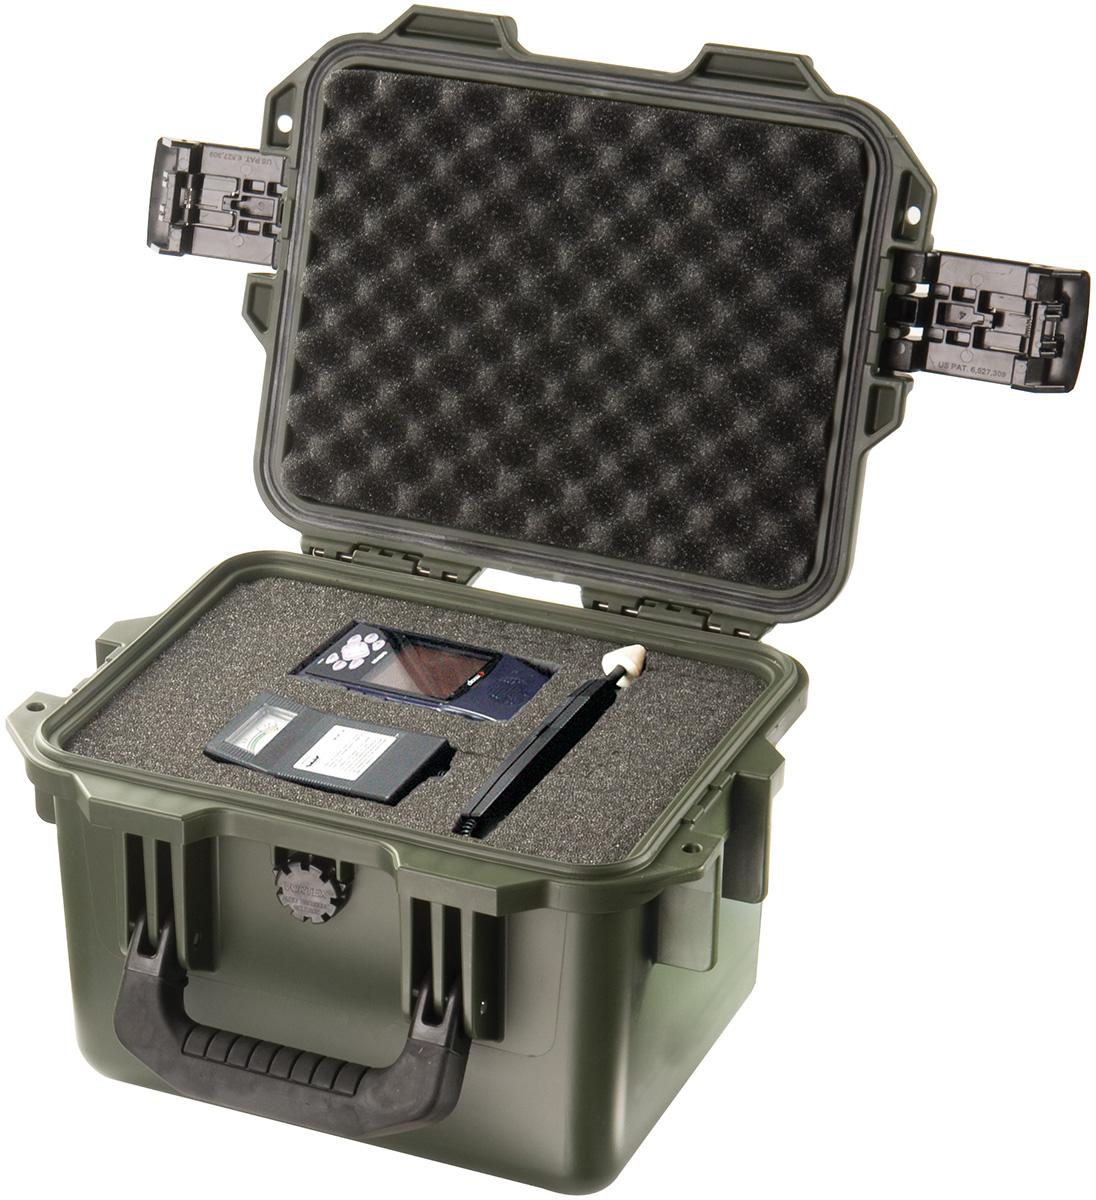 pelican peli products iM2075 storm hard electronics protective case hardigg hardcase